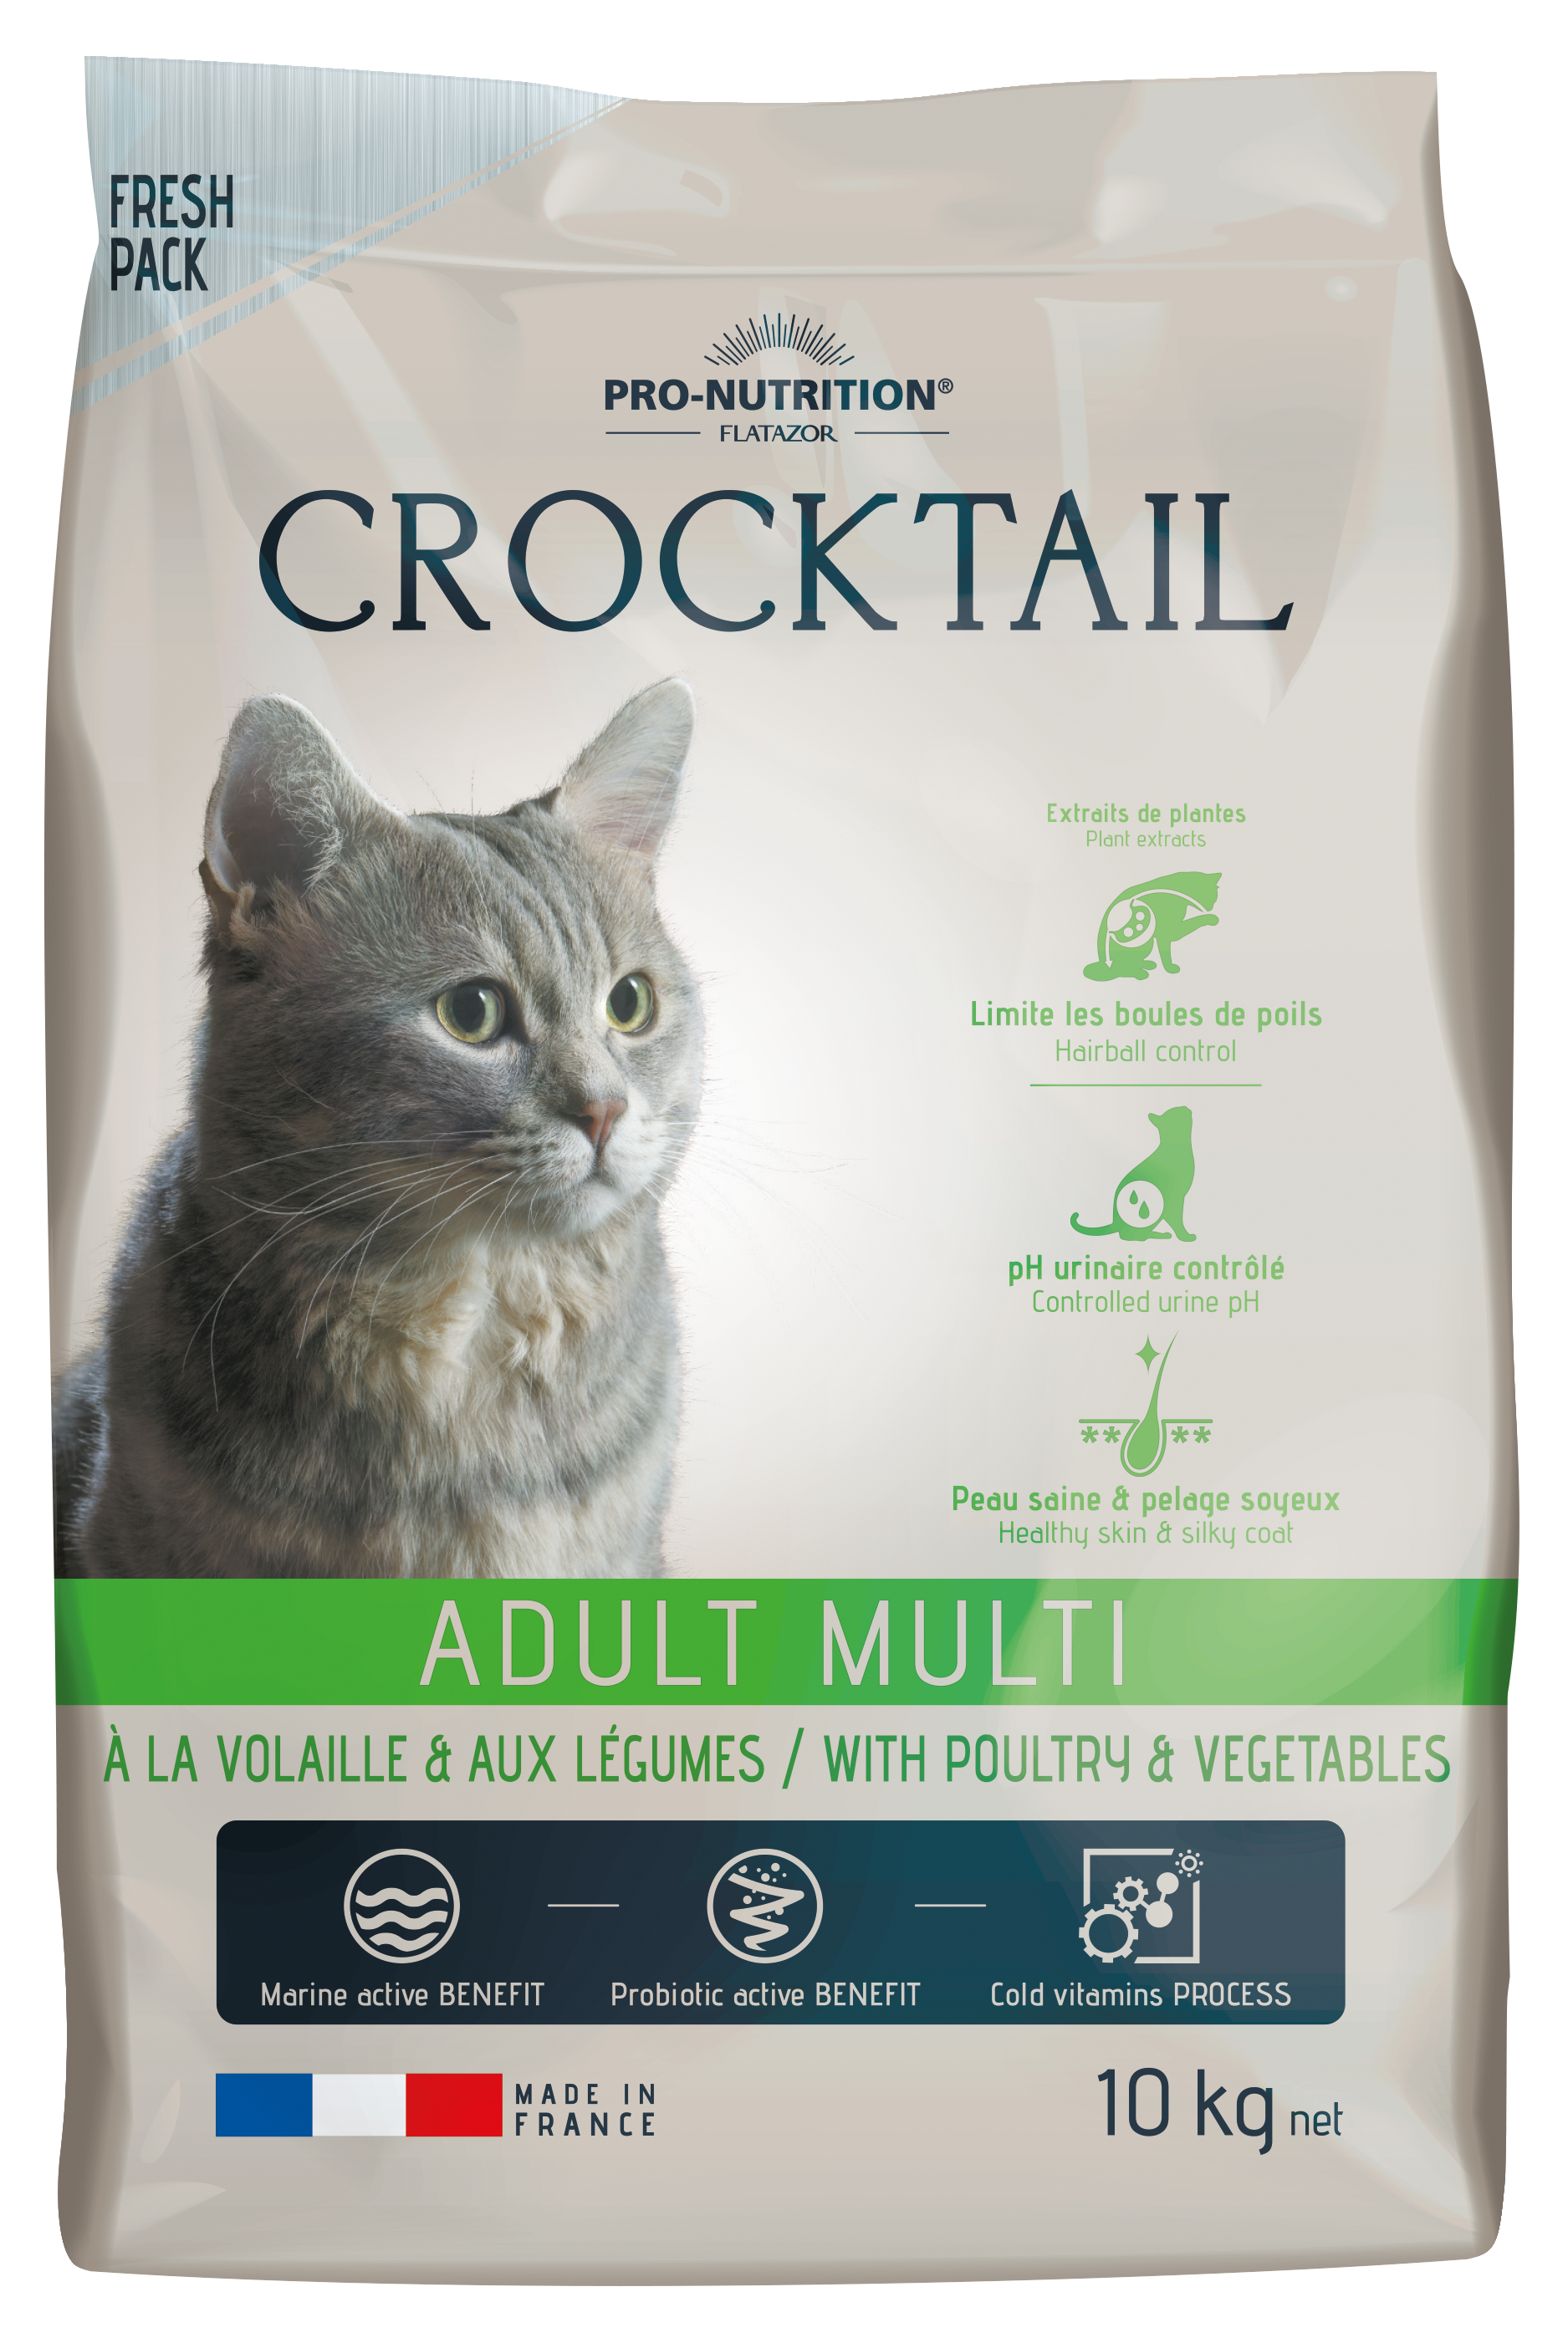 Flatazor Crocktail Multicroquette 10KG